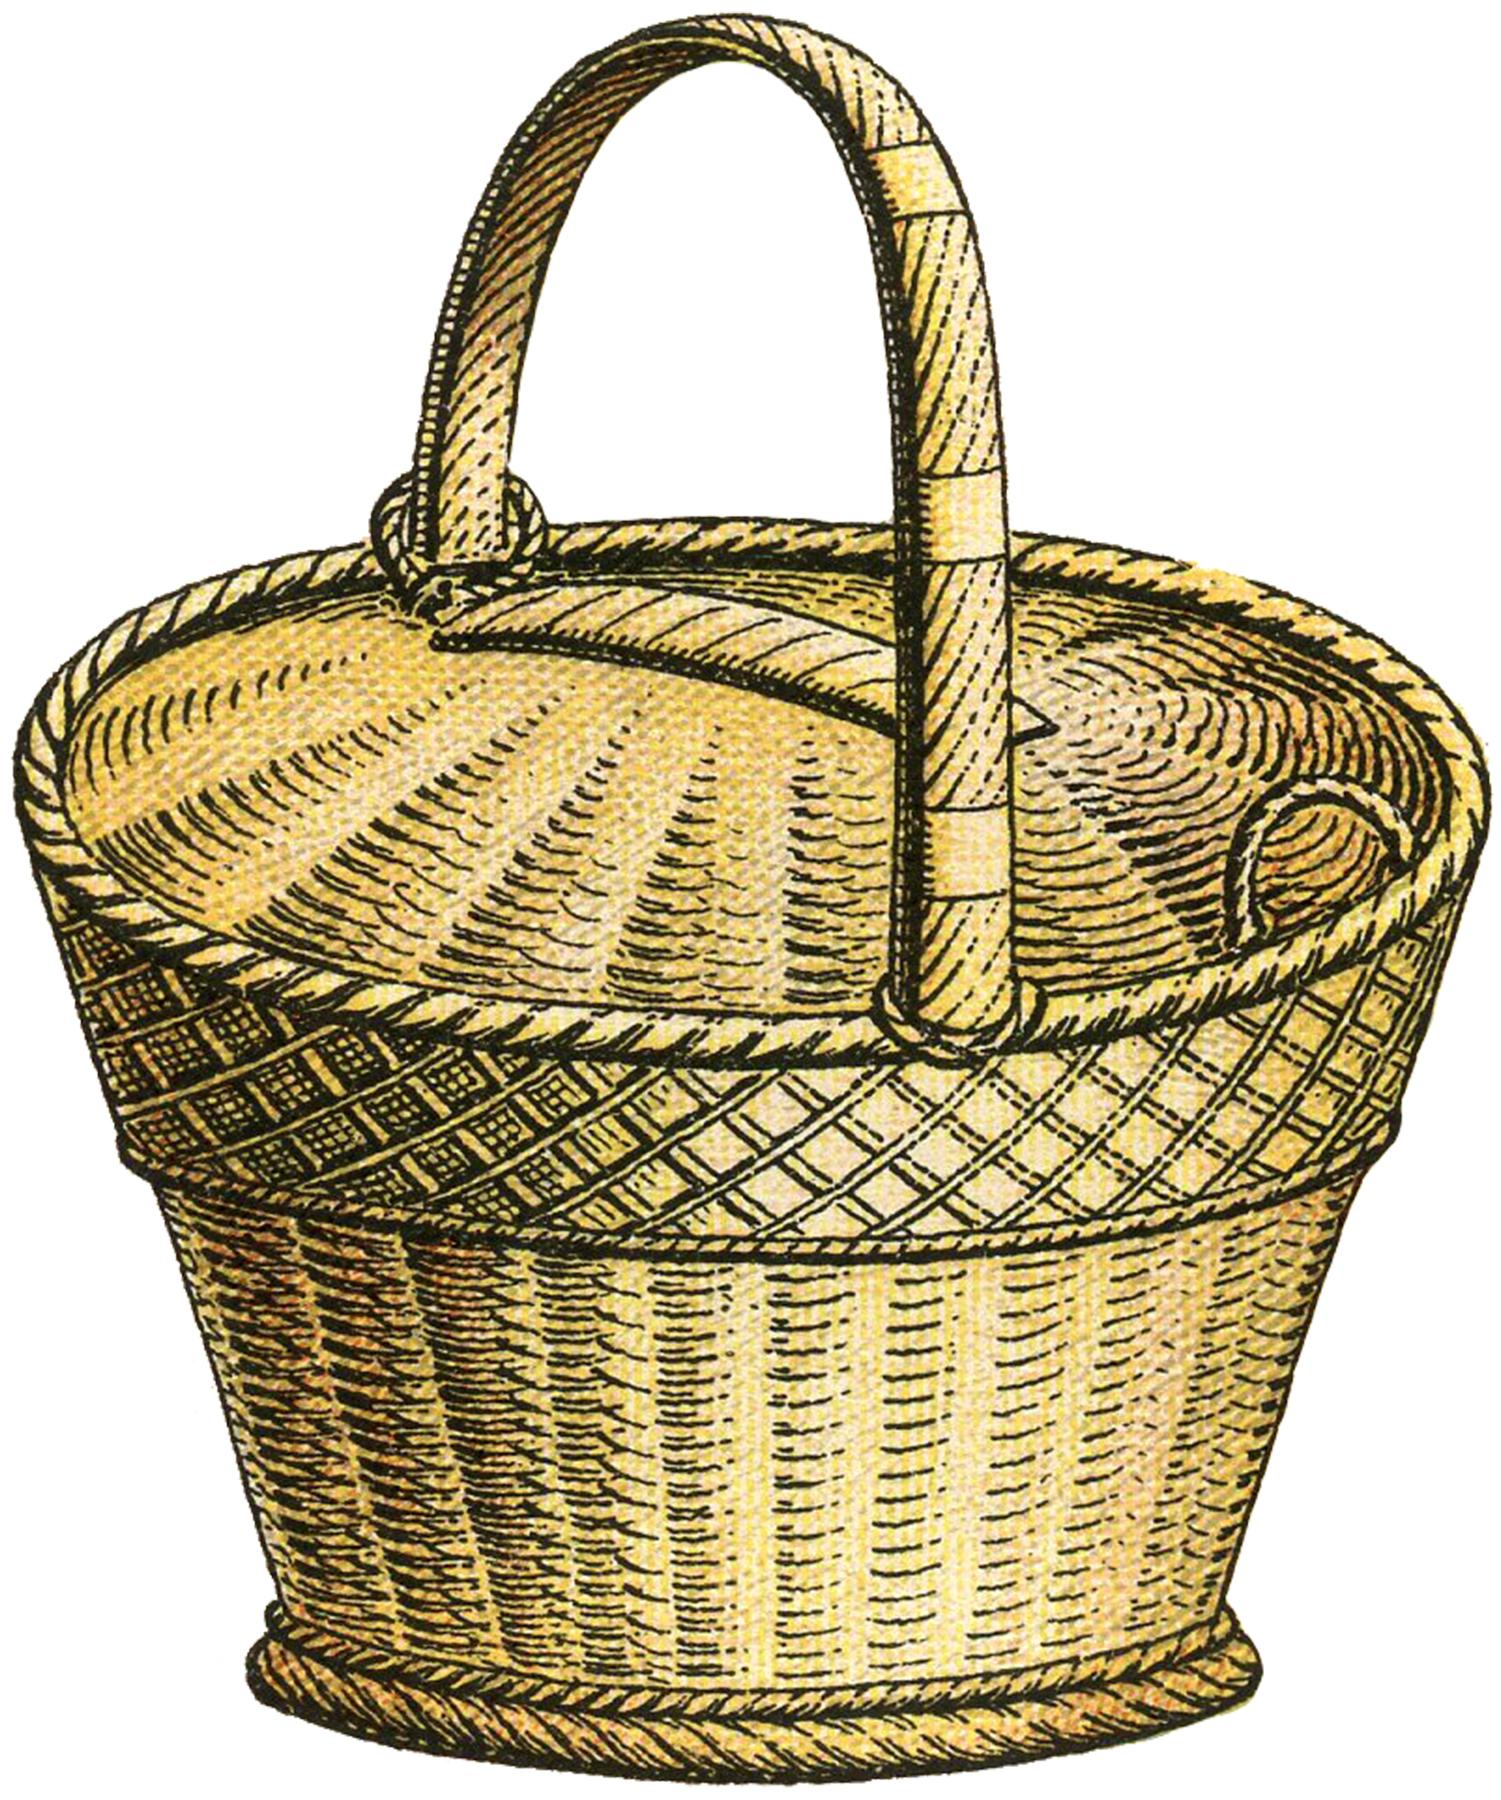 Basket clipart woven basket.